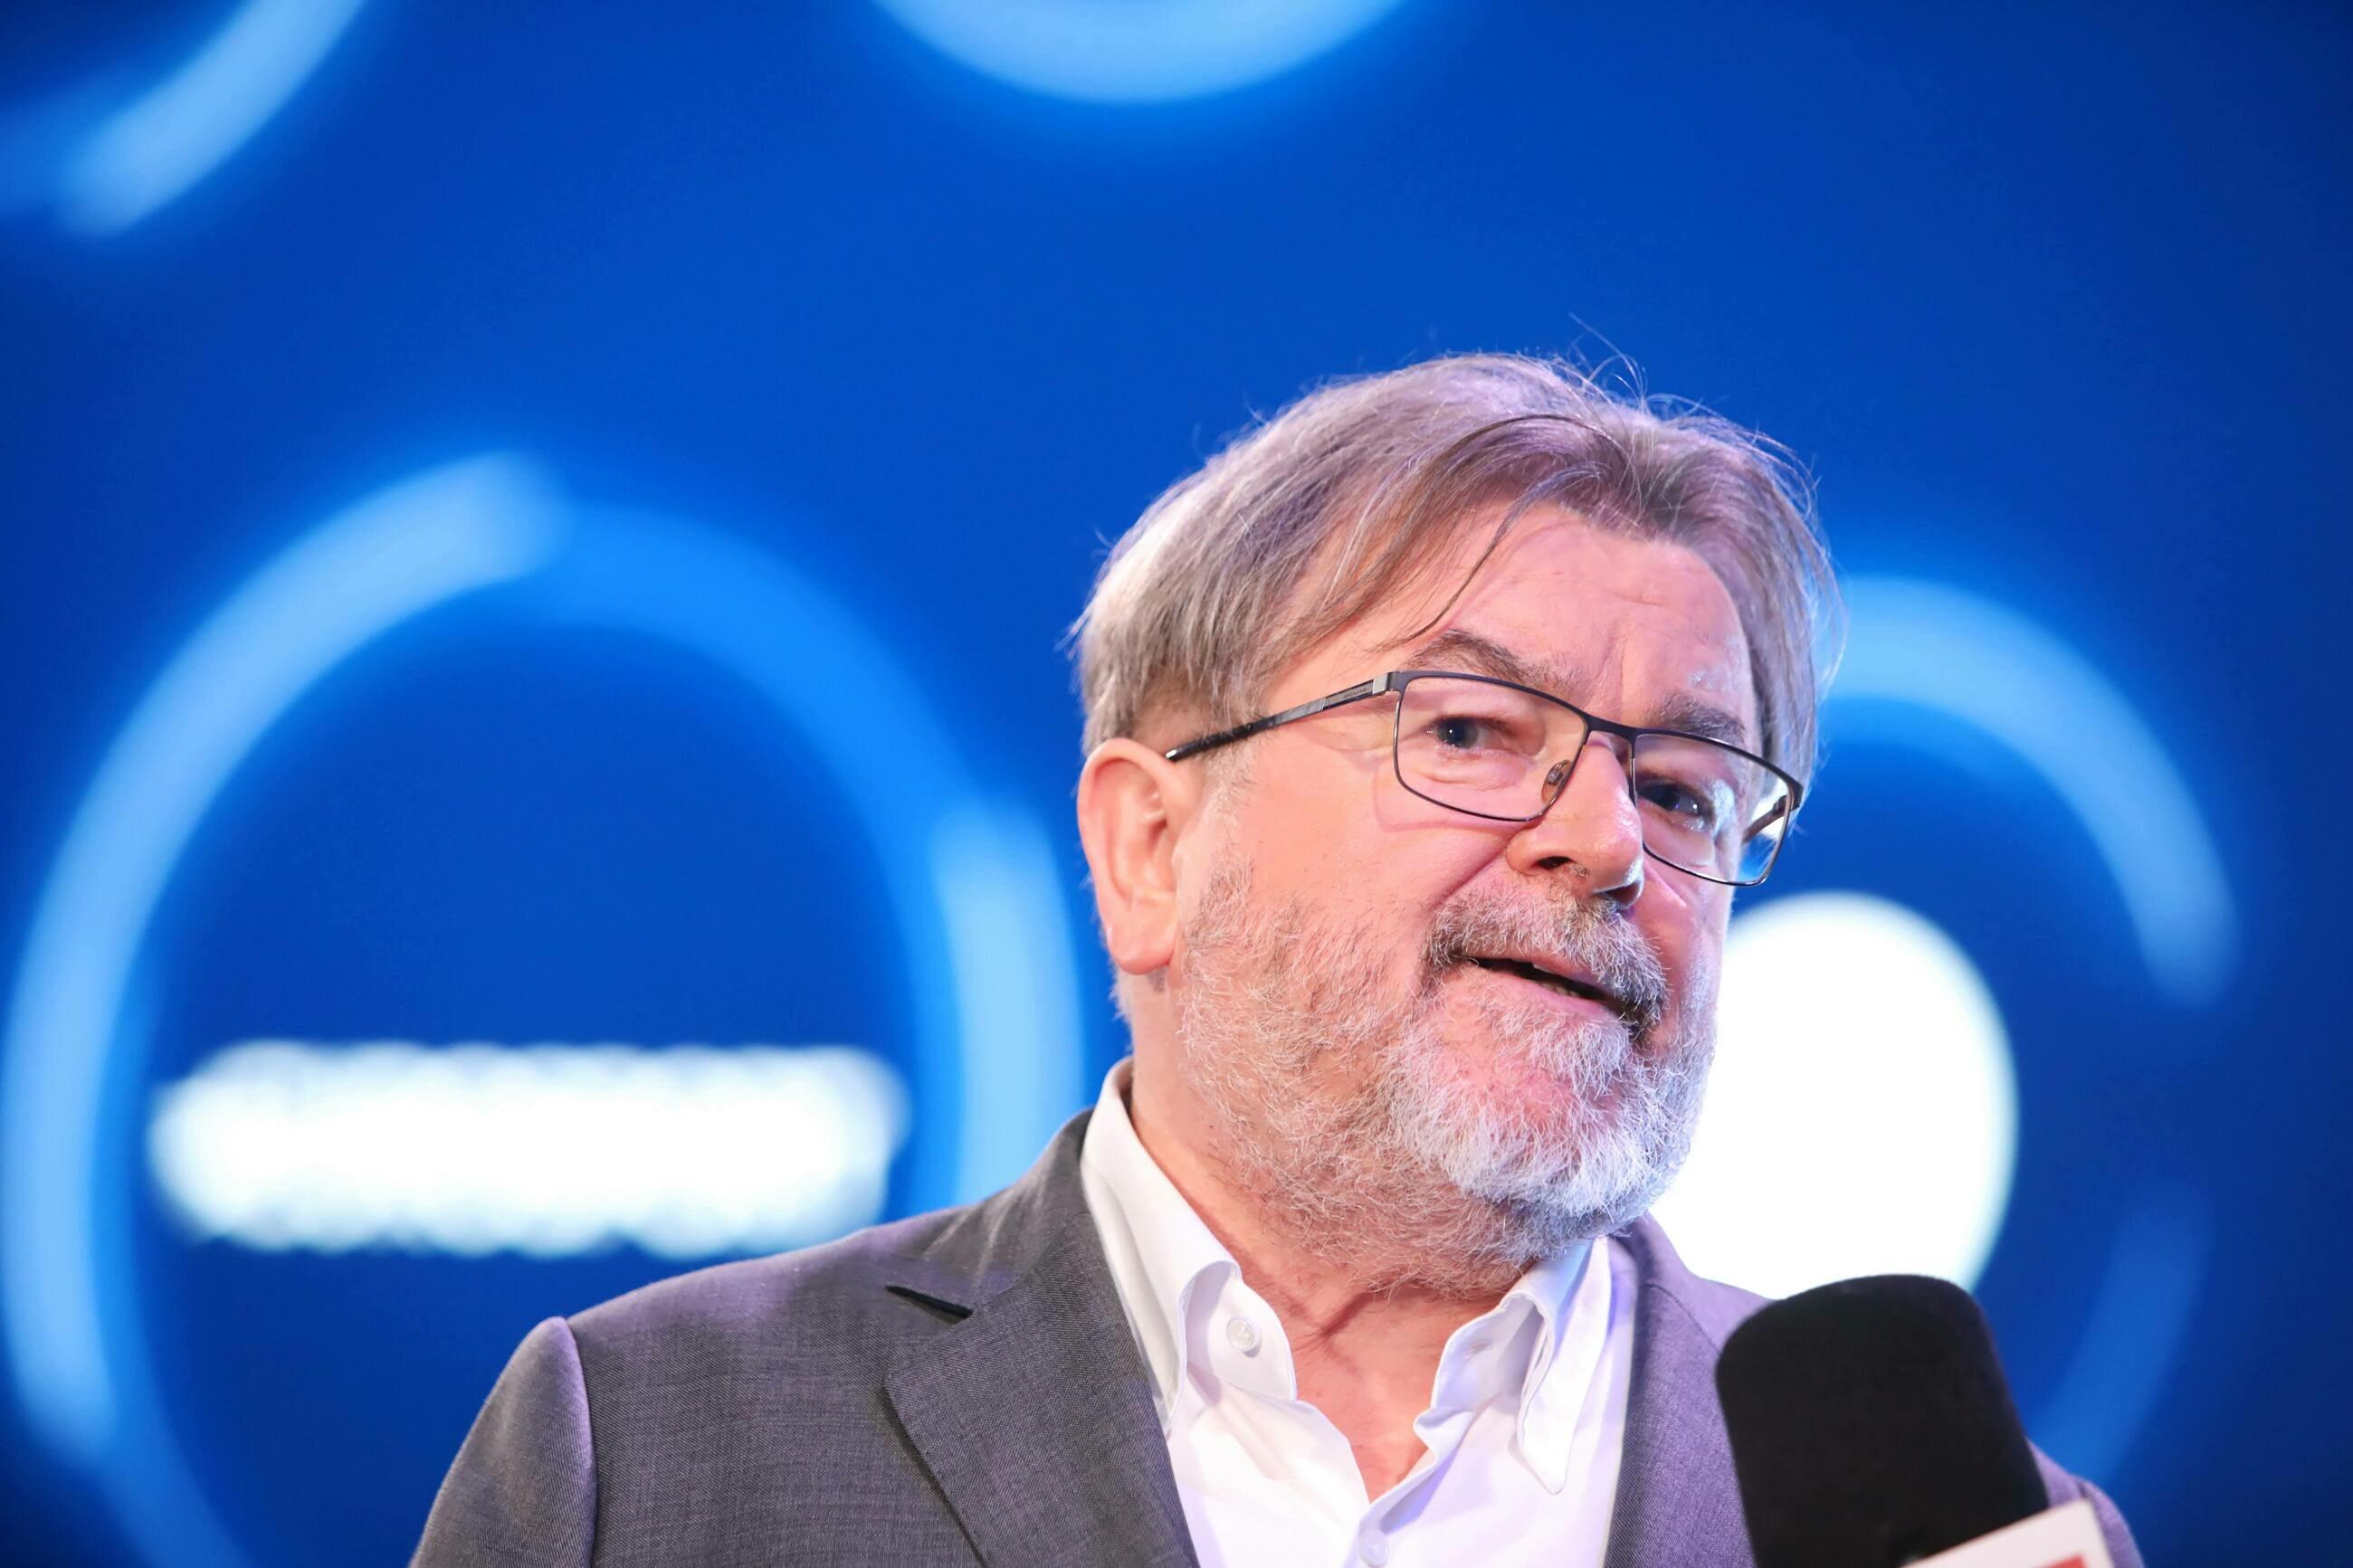 Dyrektor programowy TVN Edward Miszczak